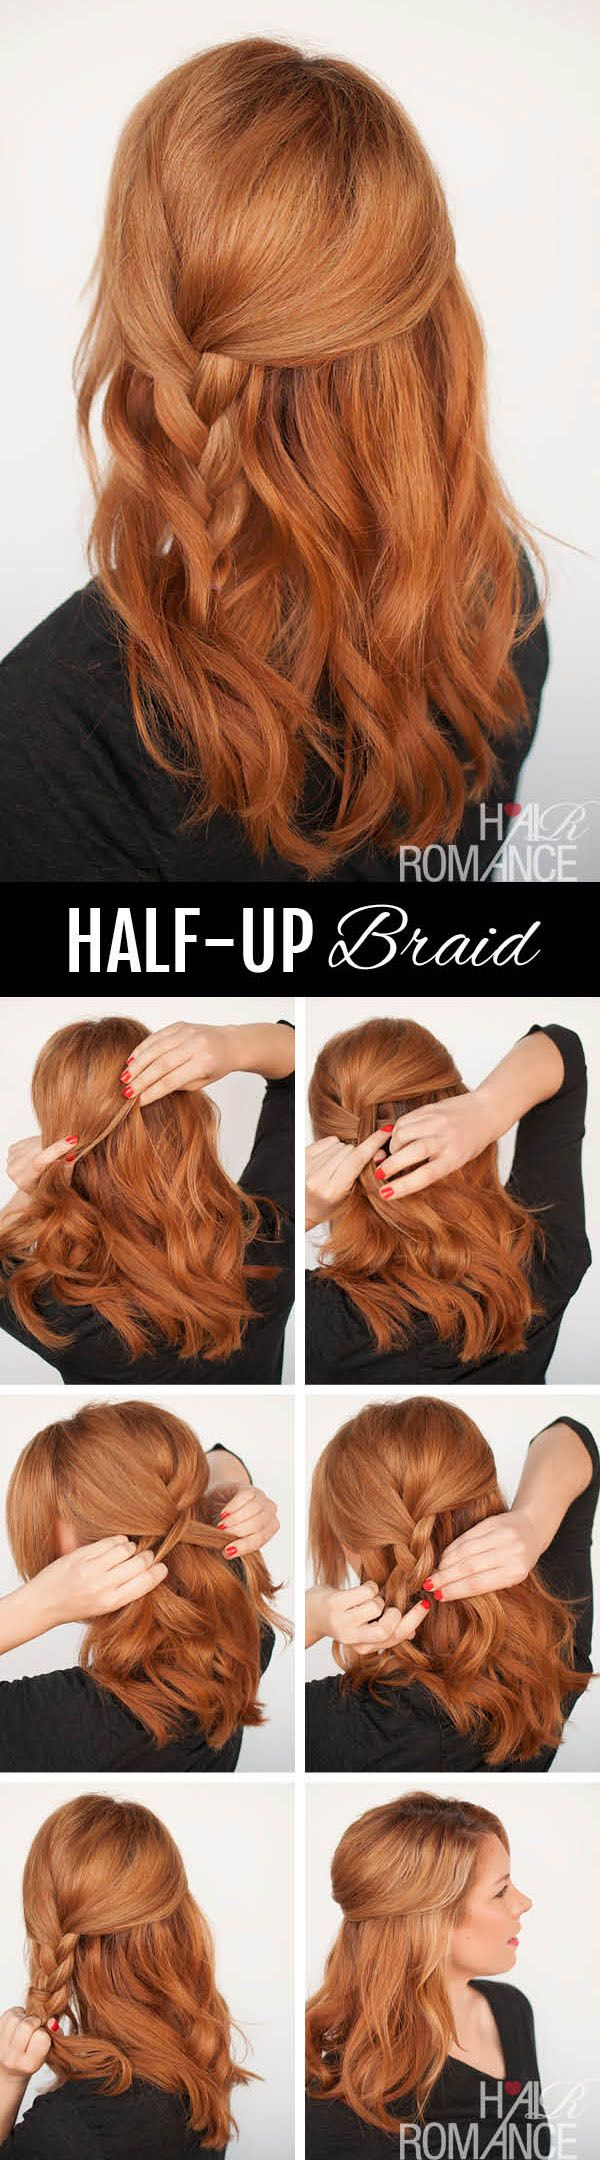 Hair romance half up side braid hairstyle tutorial short hair